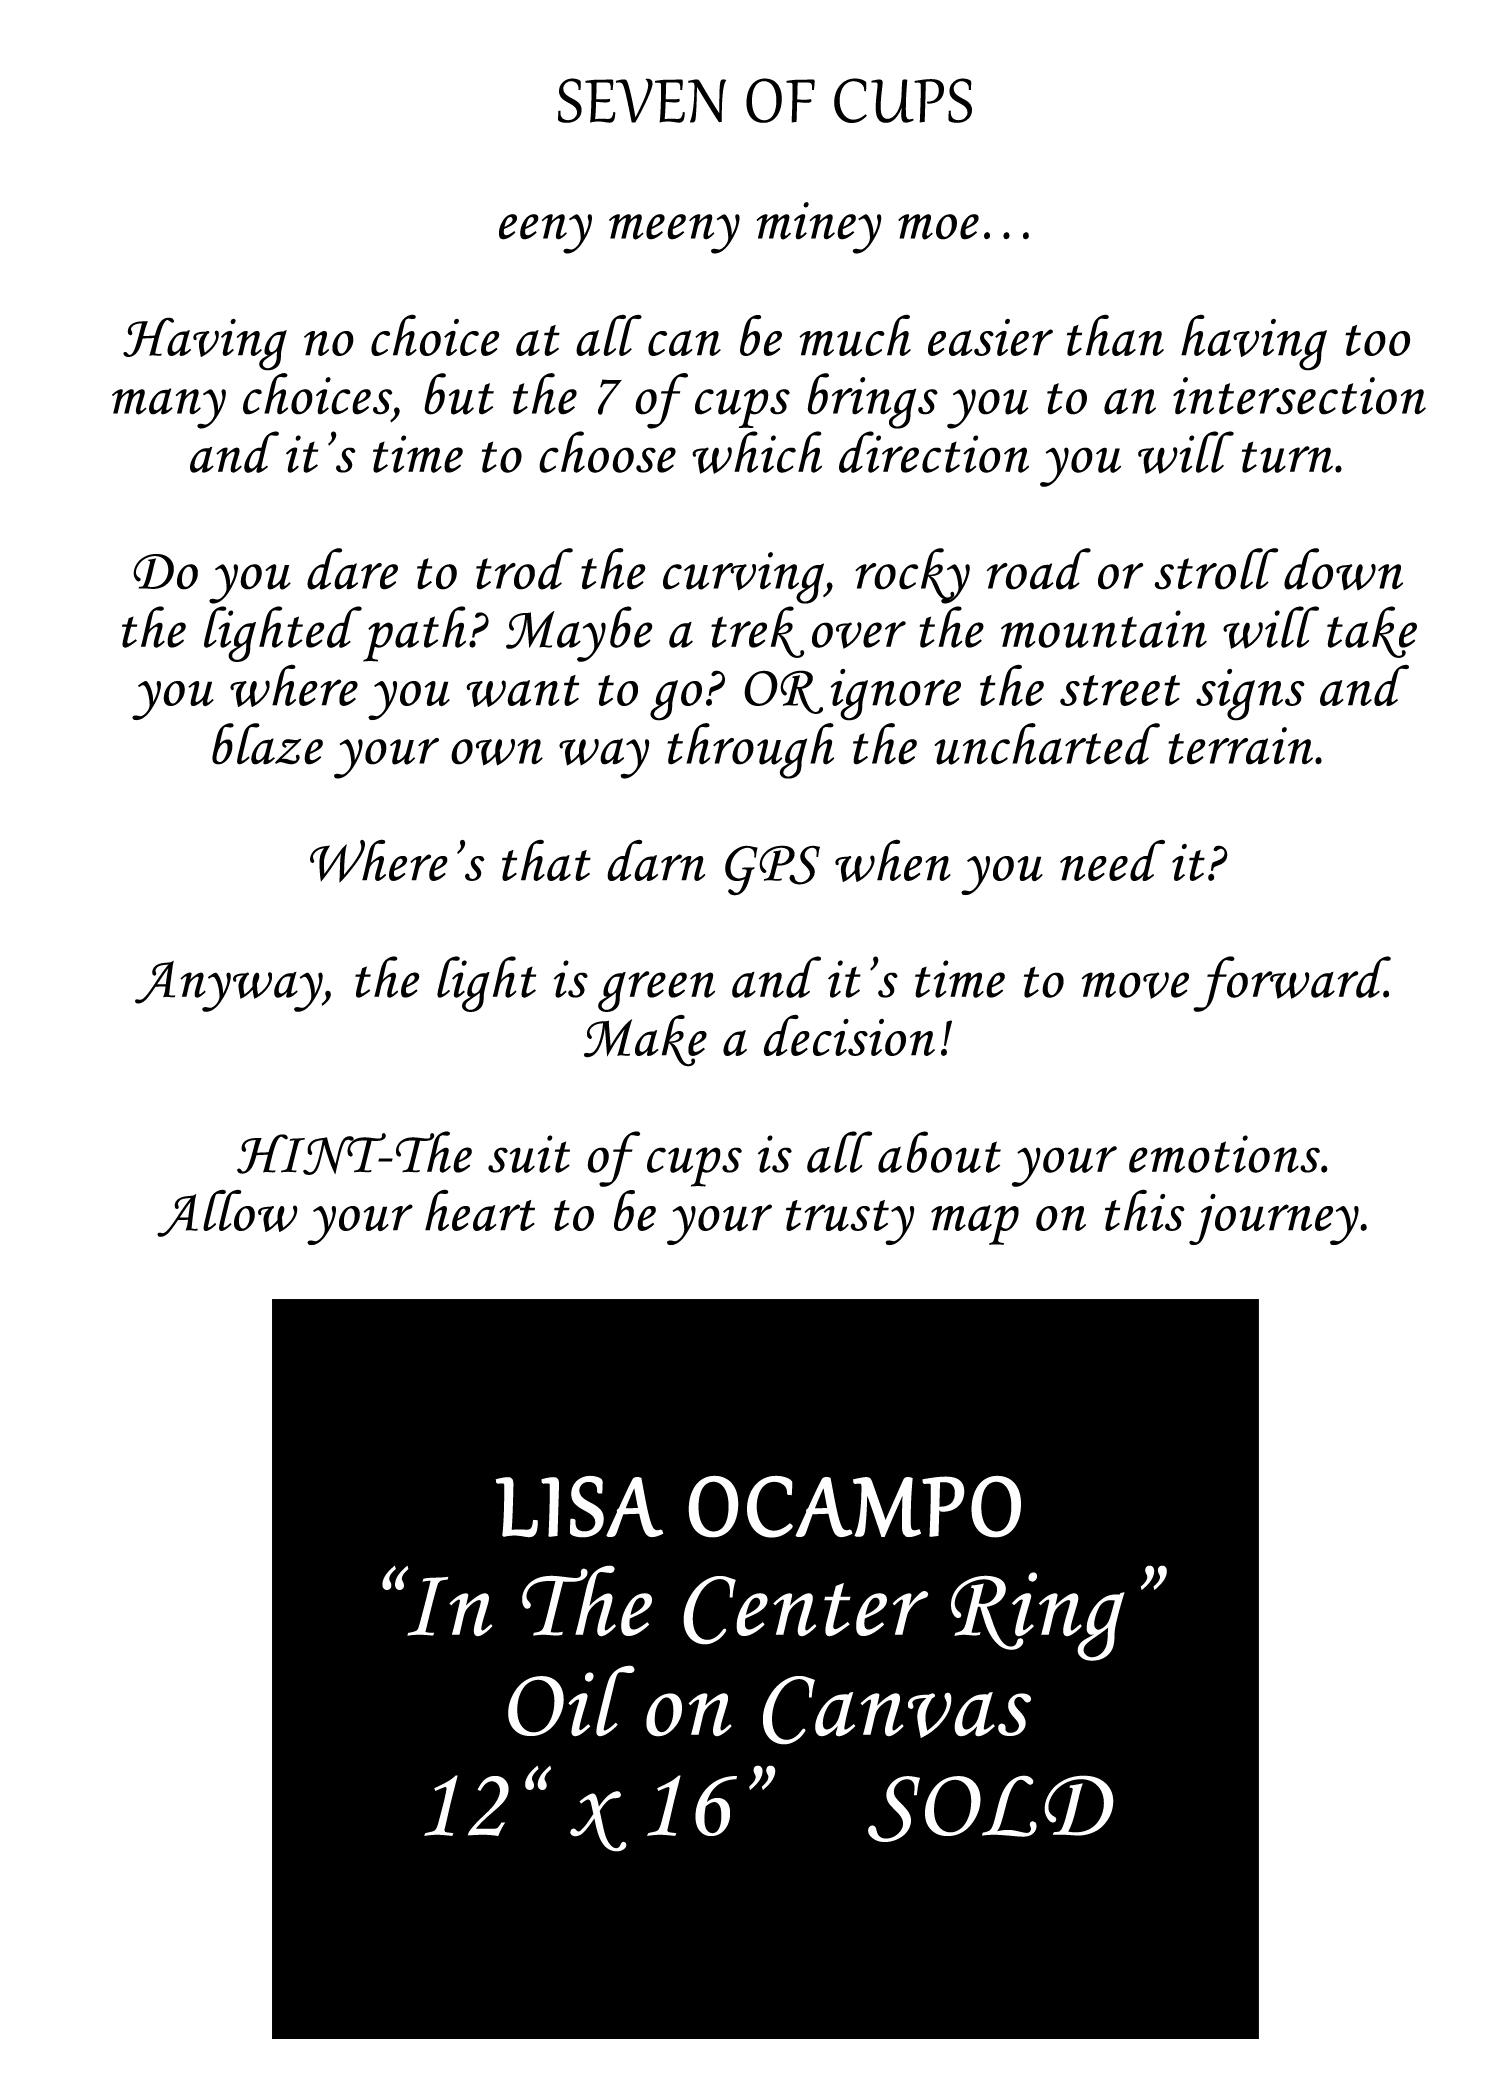 Lisa-Ocampo-Seven-Of-Cups-3.jpg